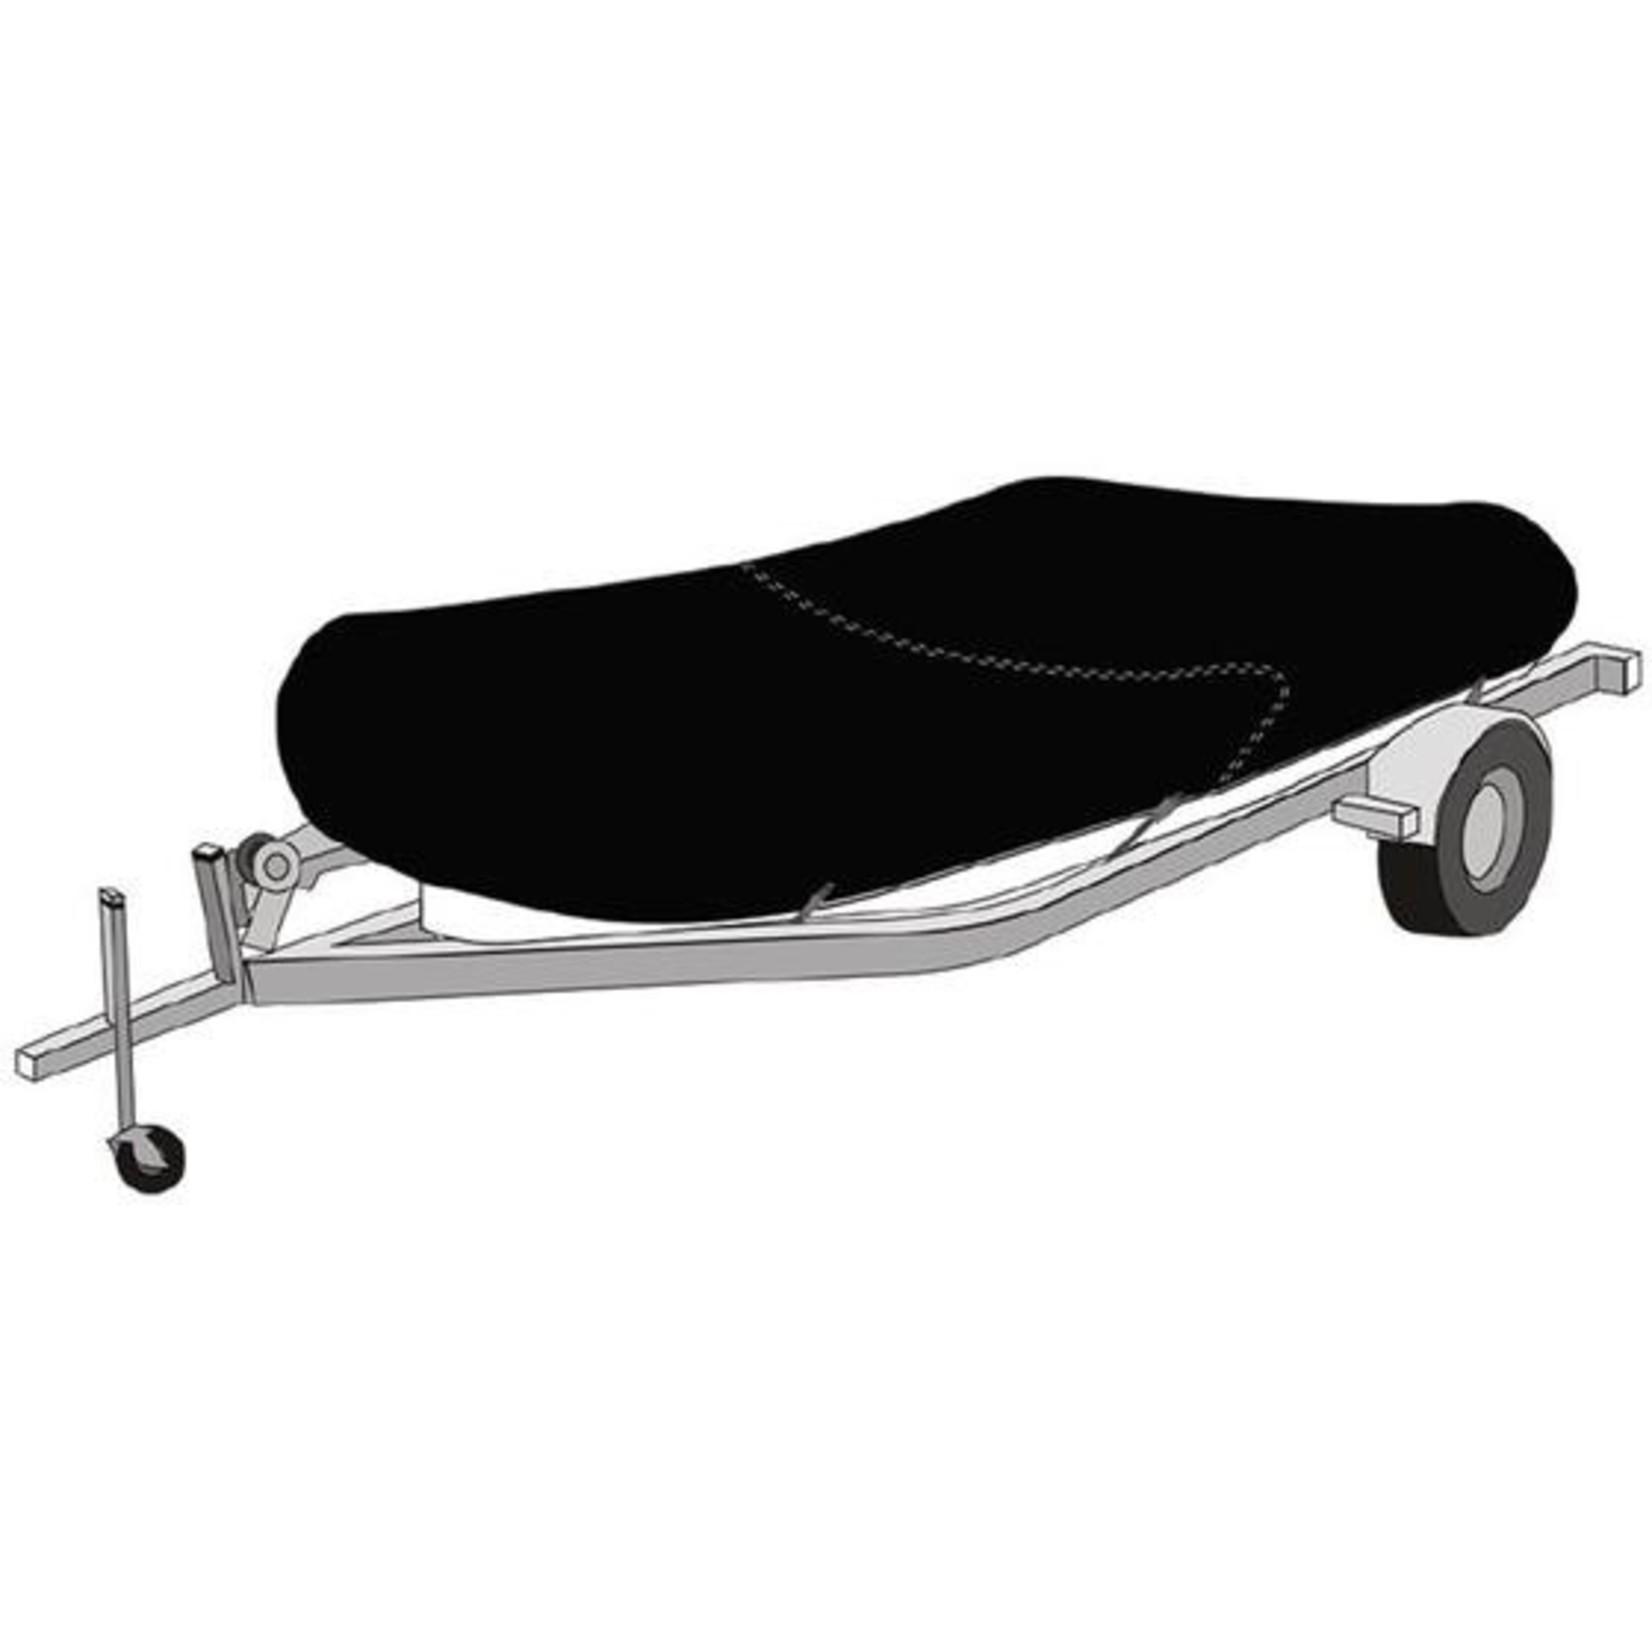 Exalto Inflatable boatcover Size E - length: 3.70 - 4.20 m